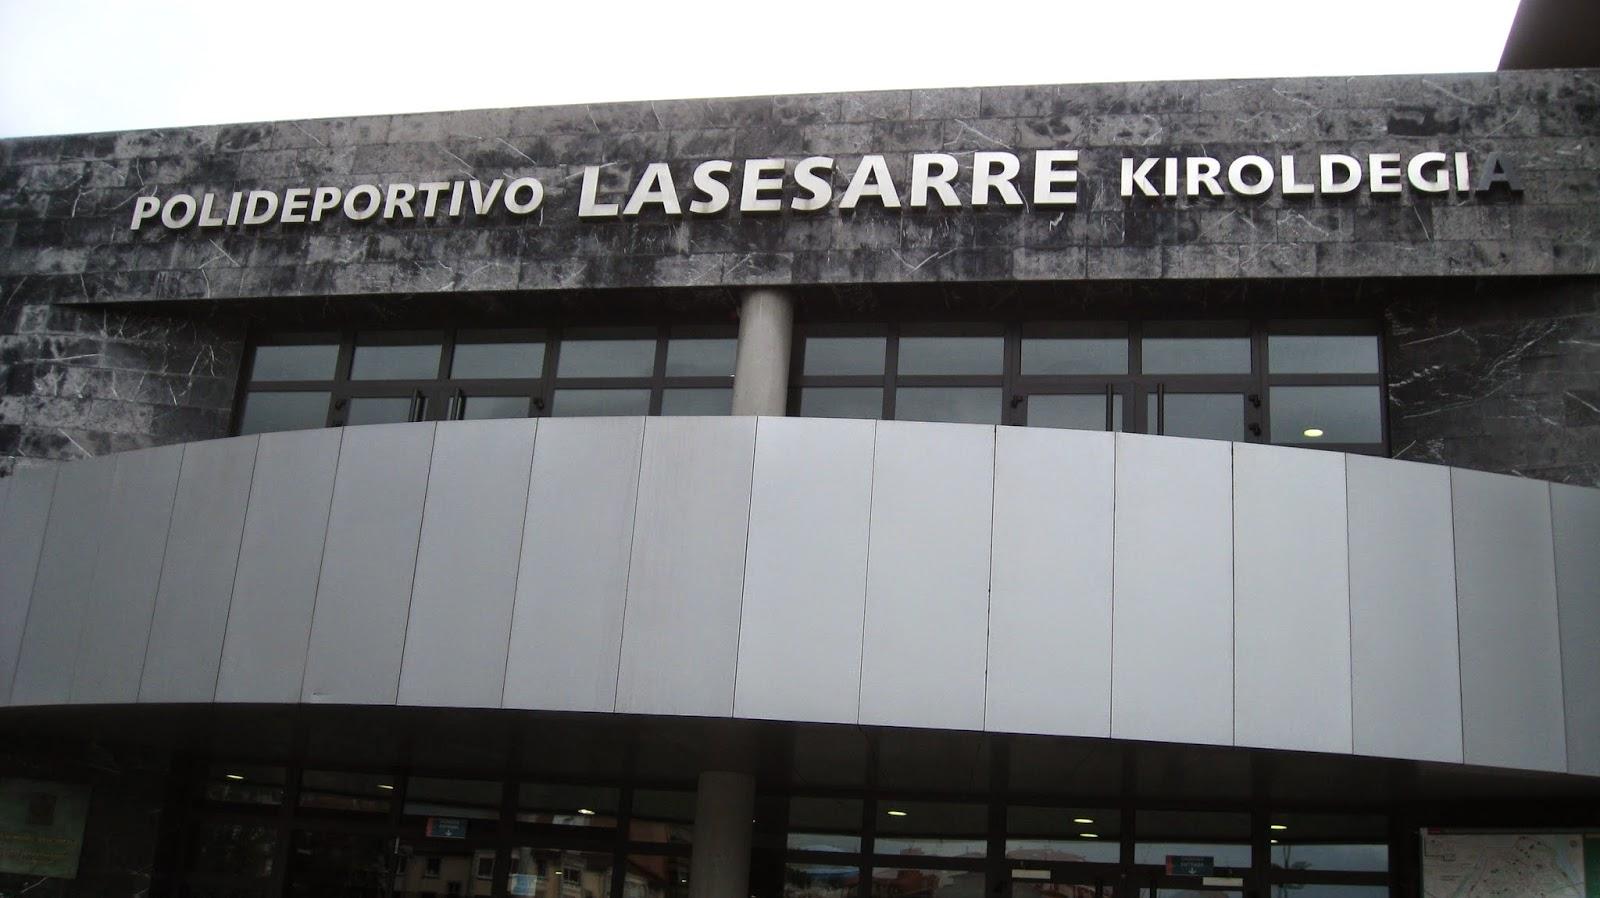 Polideportivo de Lasesarre